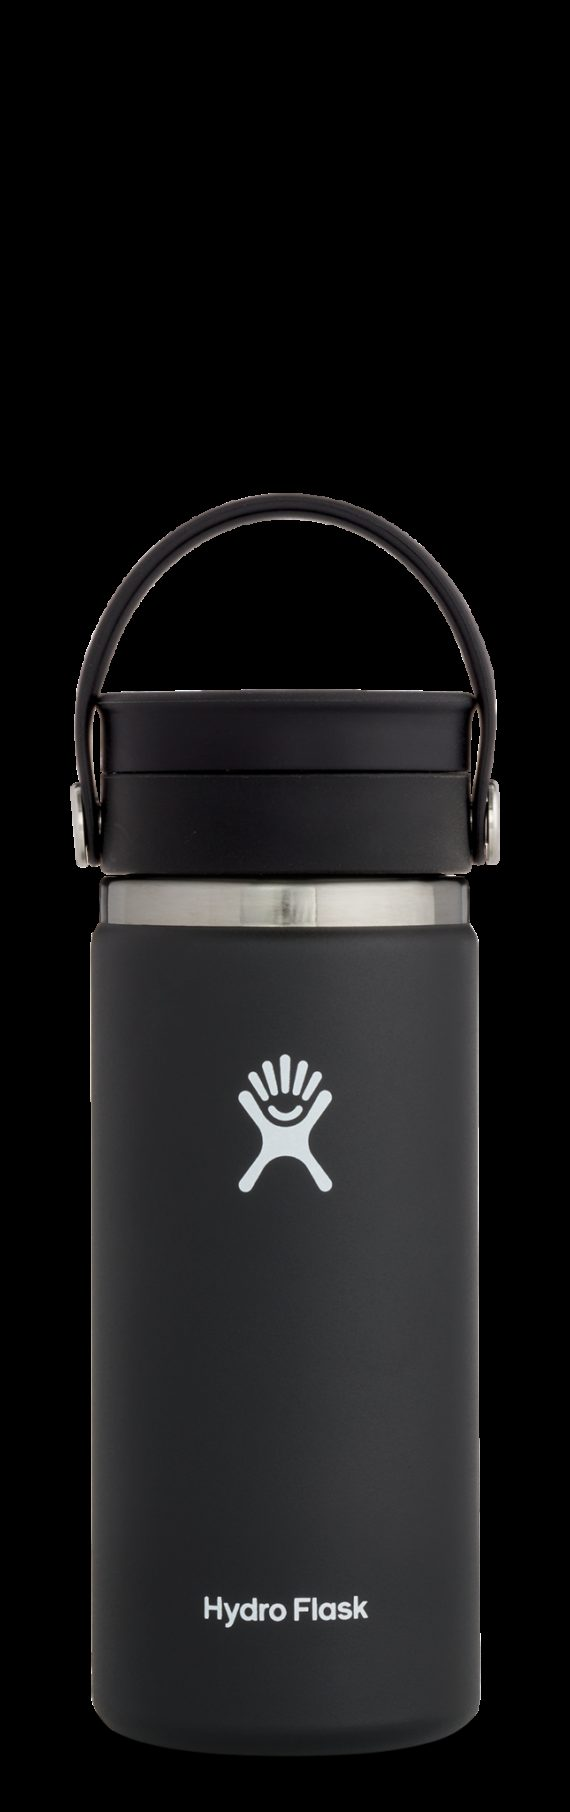 Hydro Flask 16oz Coffee Thermosfles 473ml met Flex Sip dop